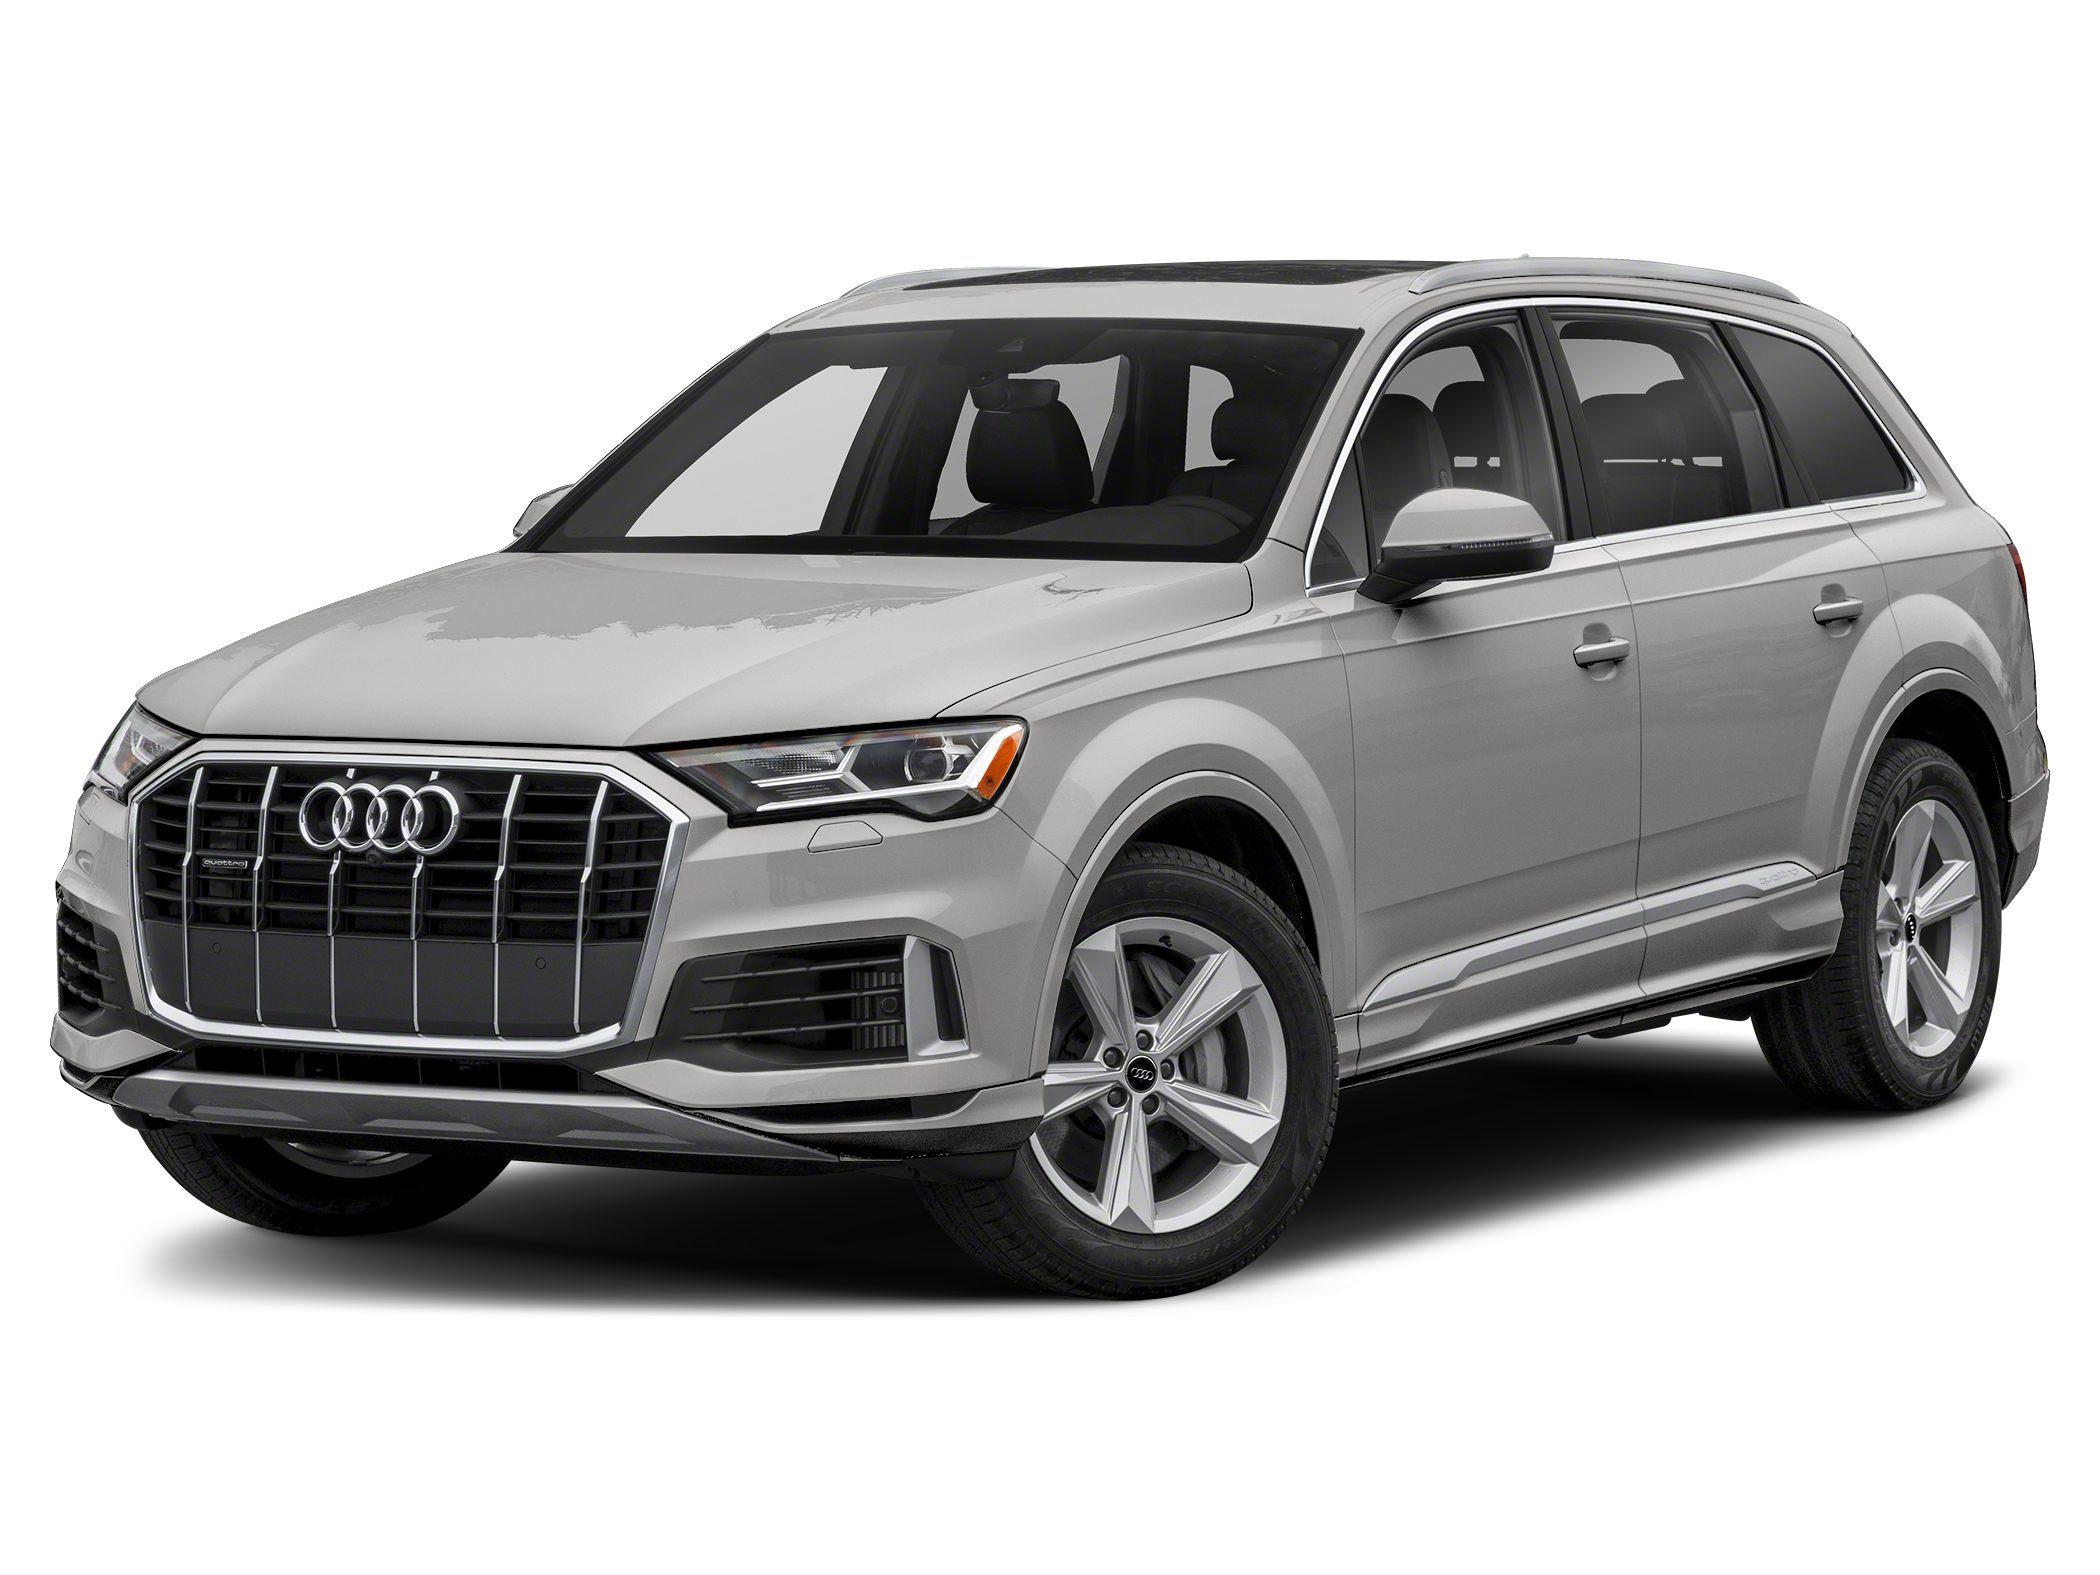 2020 Audi Q7 Sport Utility Vehicle